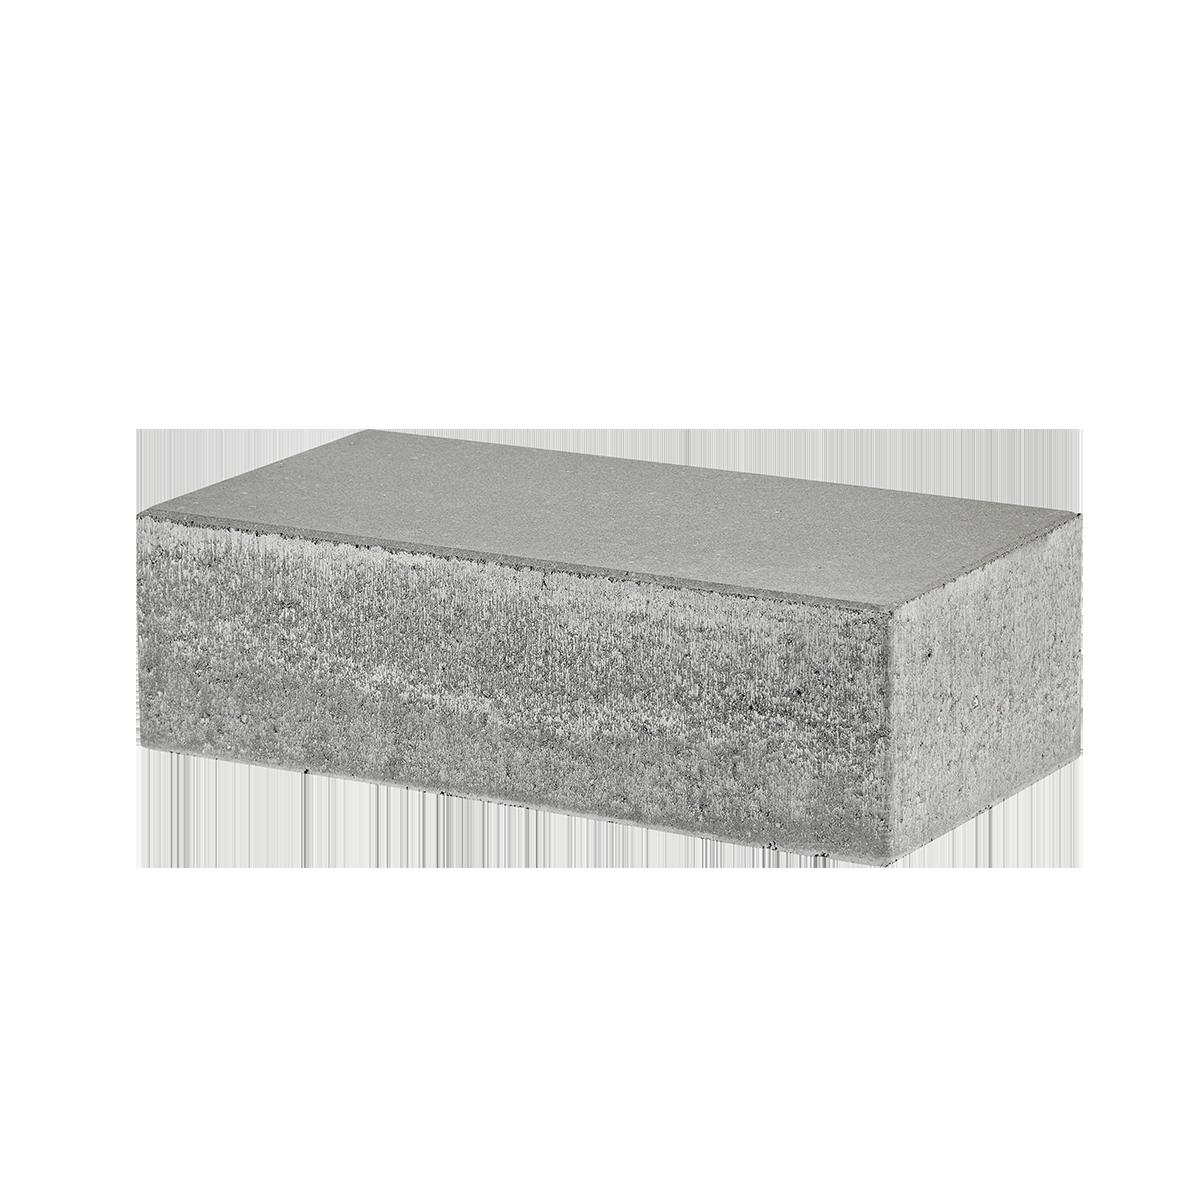 Trappetrin 60x30x18 cm Grå Lige kant